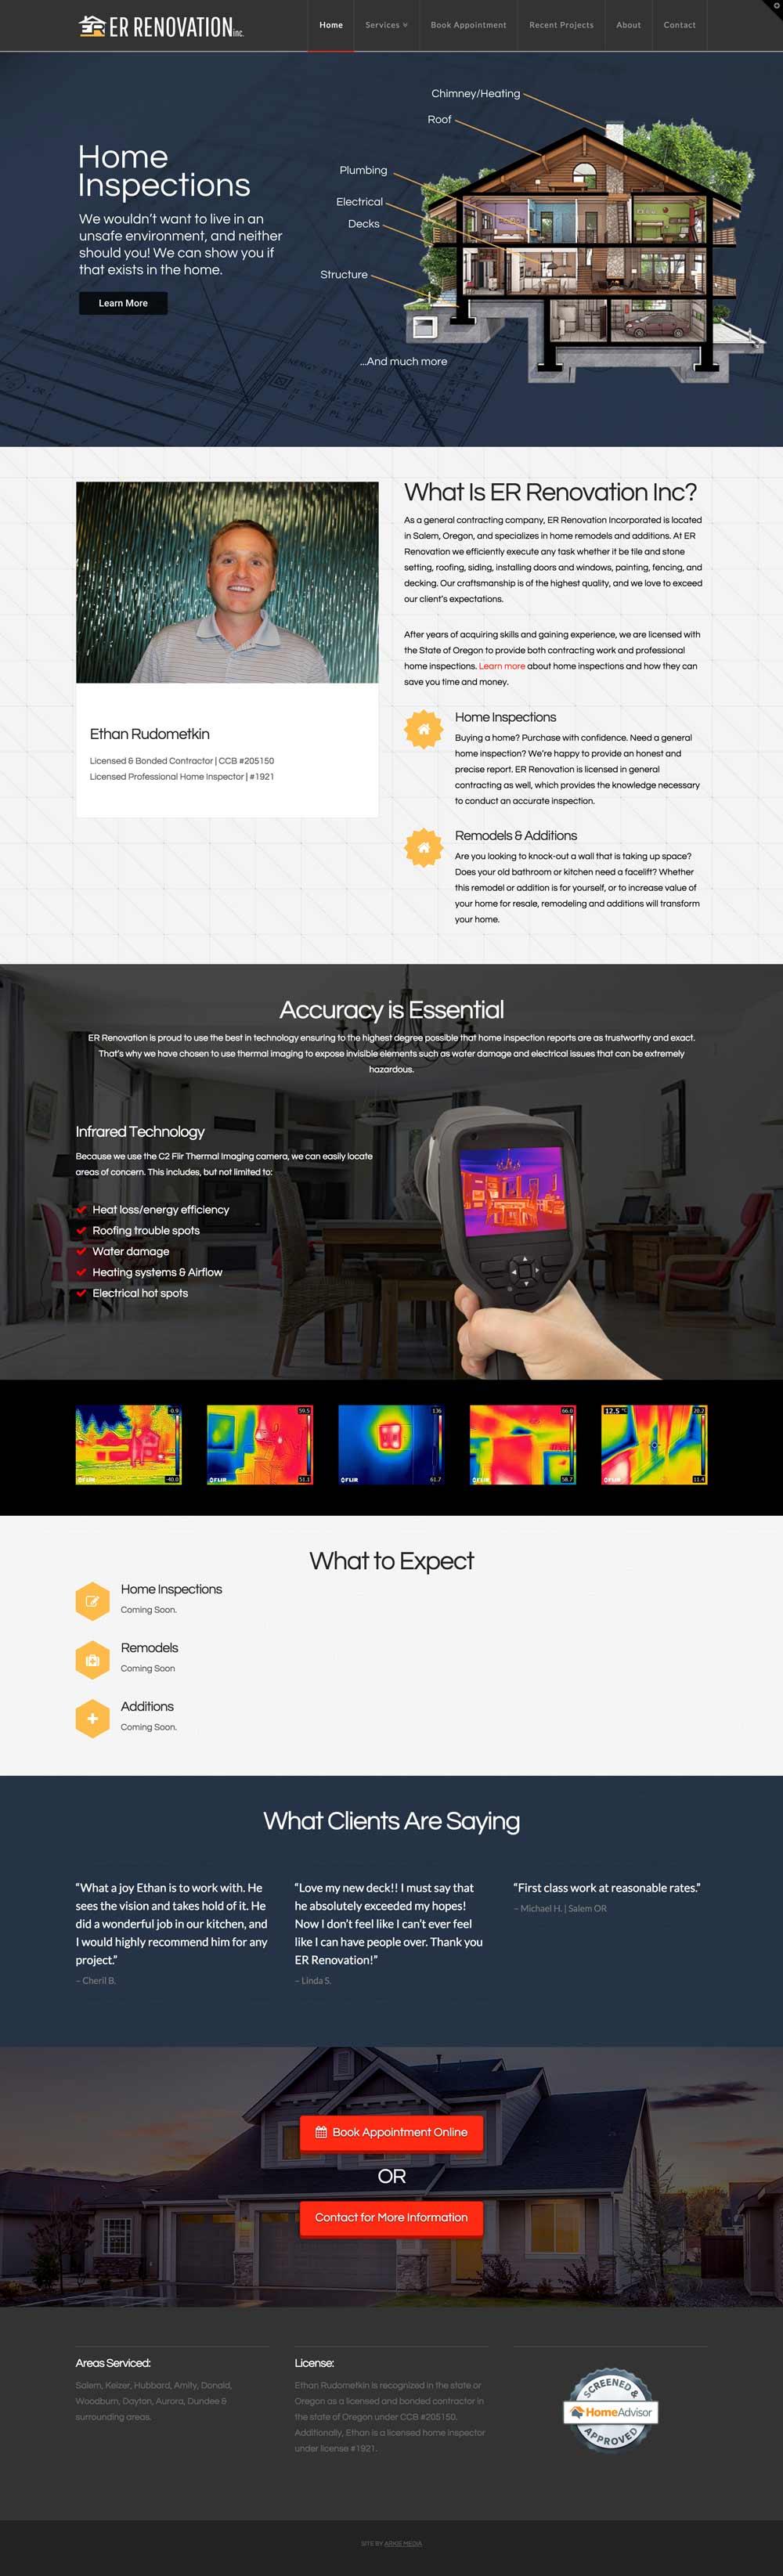 Home Inspection Website - Arkie Media